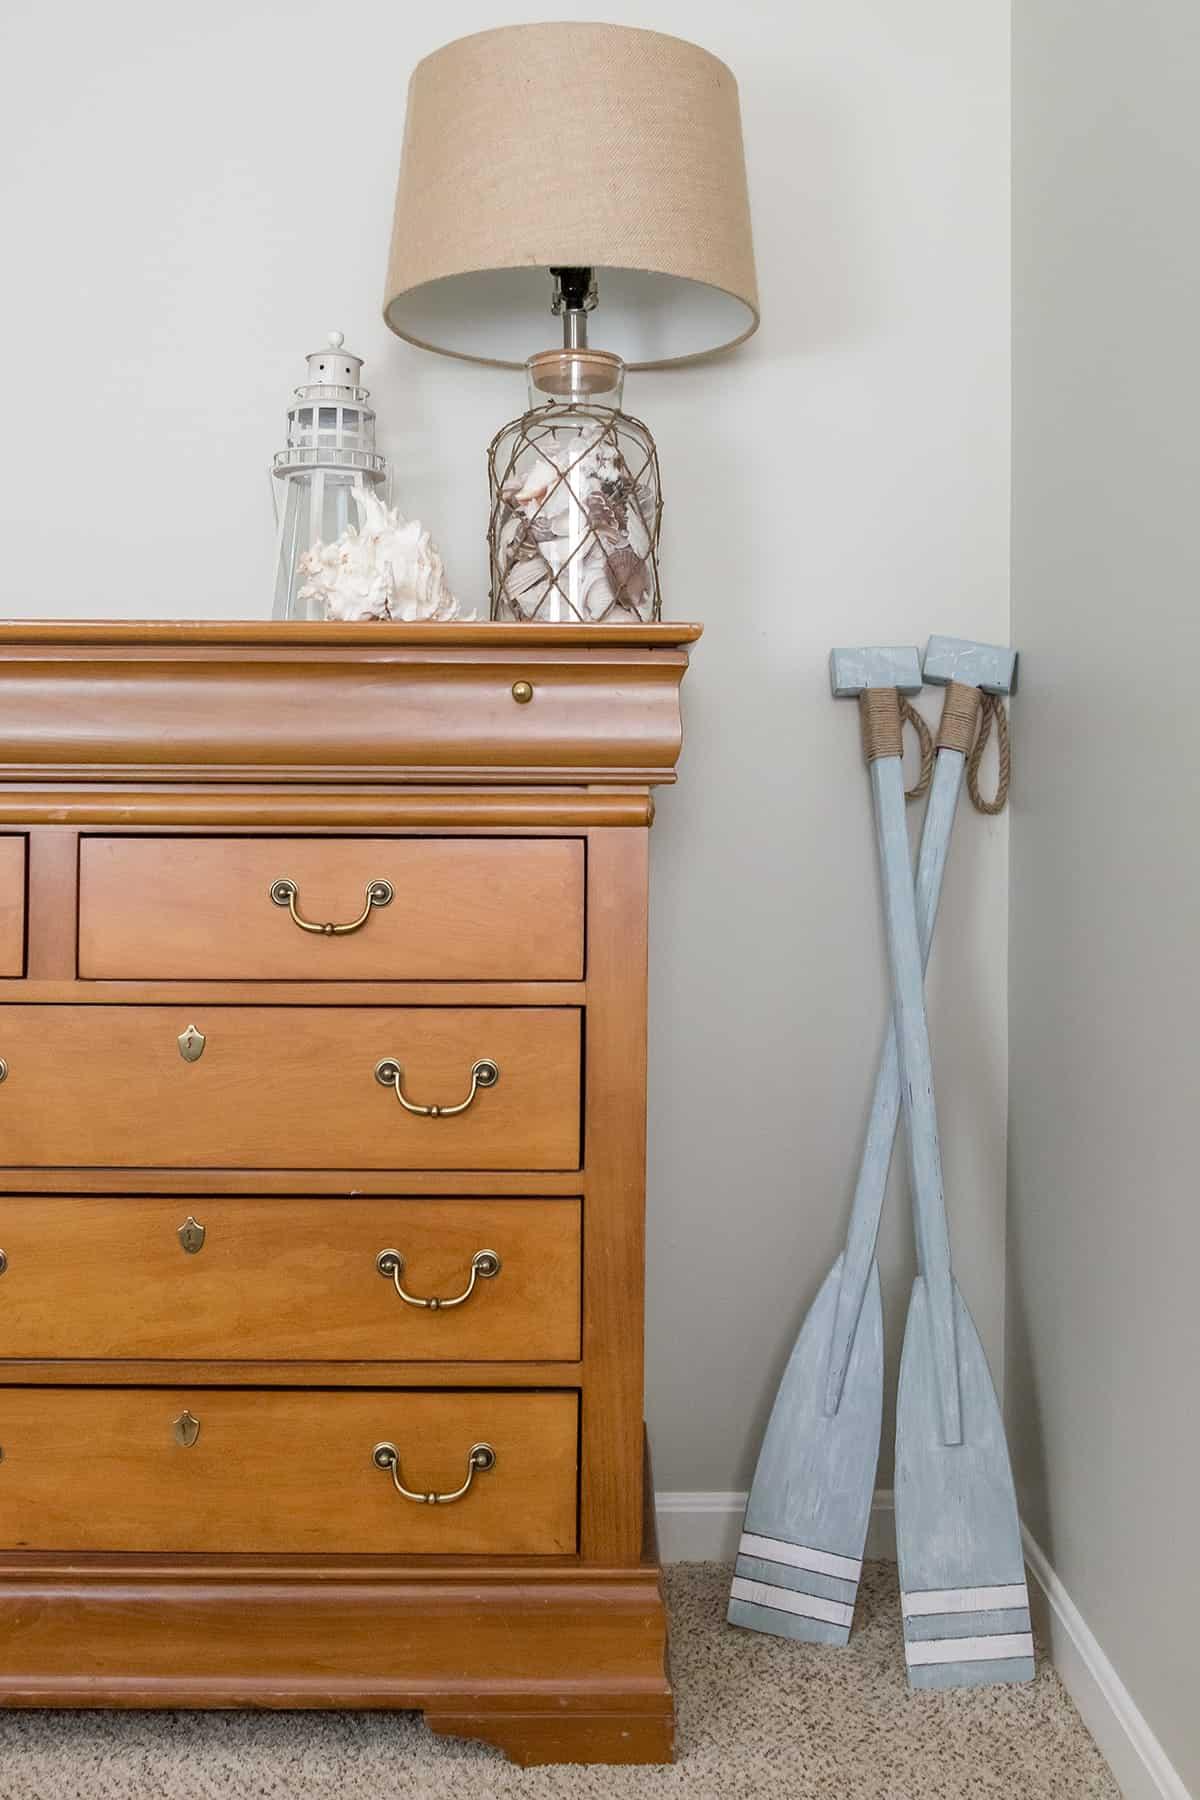 Soft blue white washed boating oars in bedroom corner by dresser